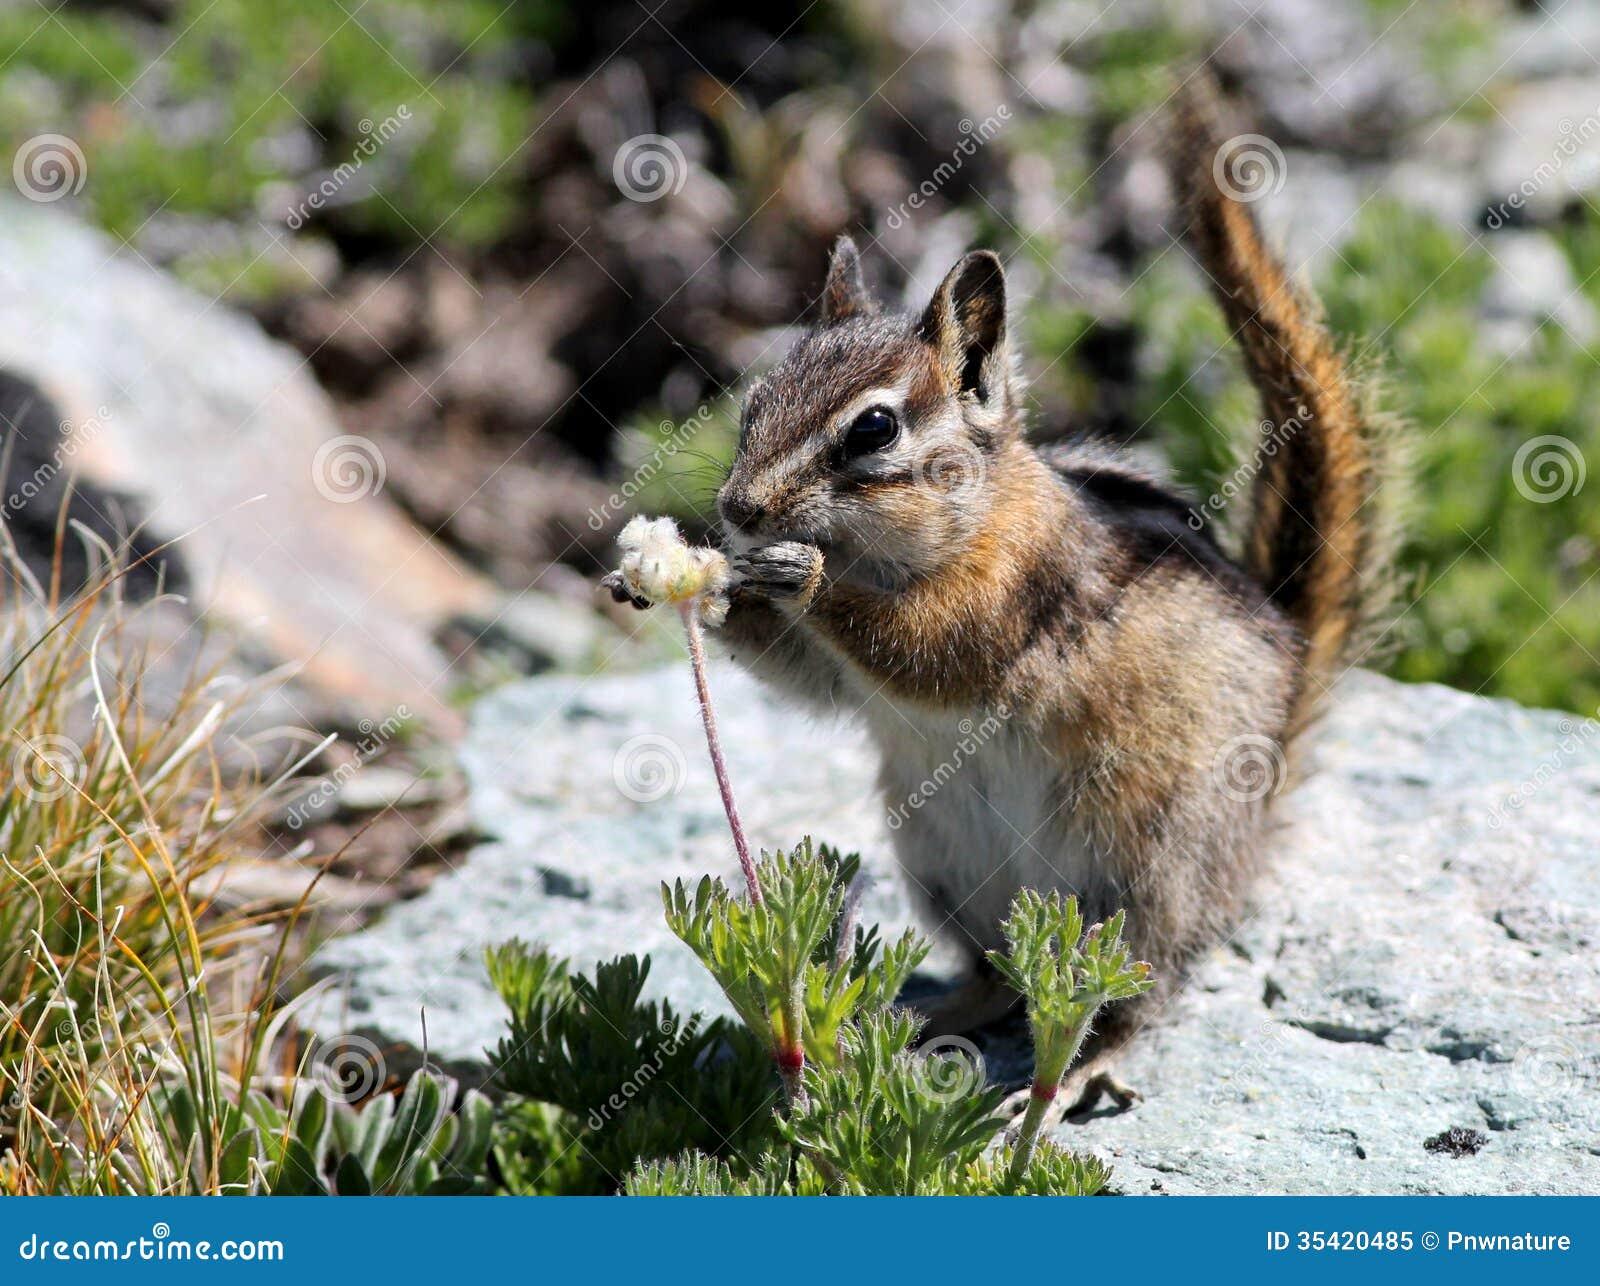 Chipmunk Eating Seeds